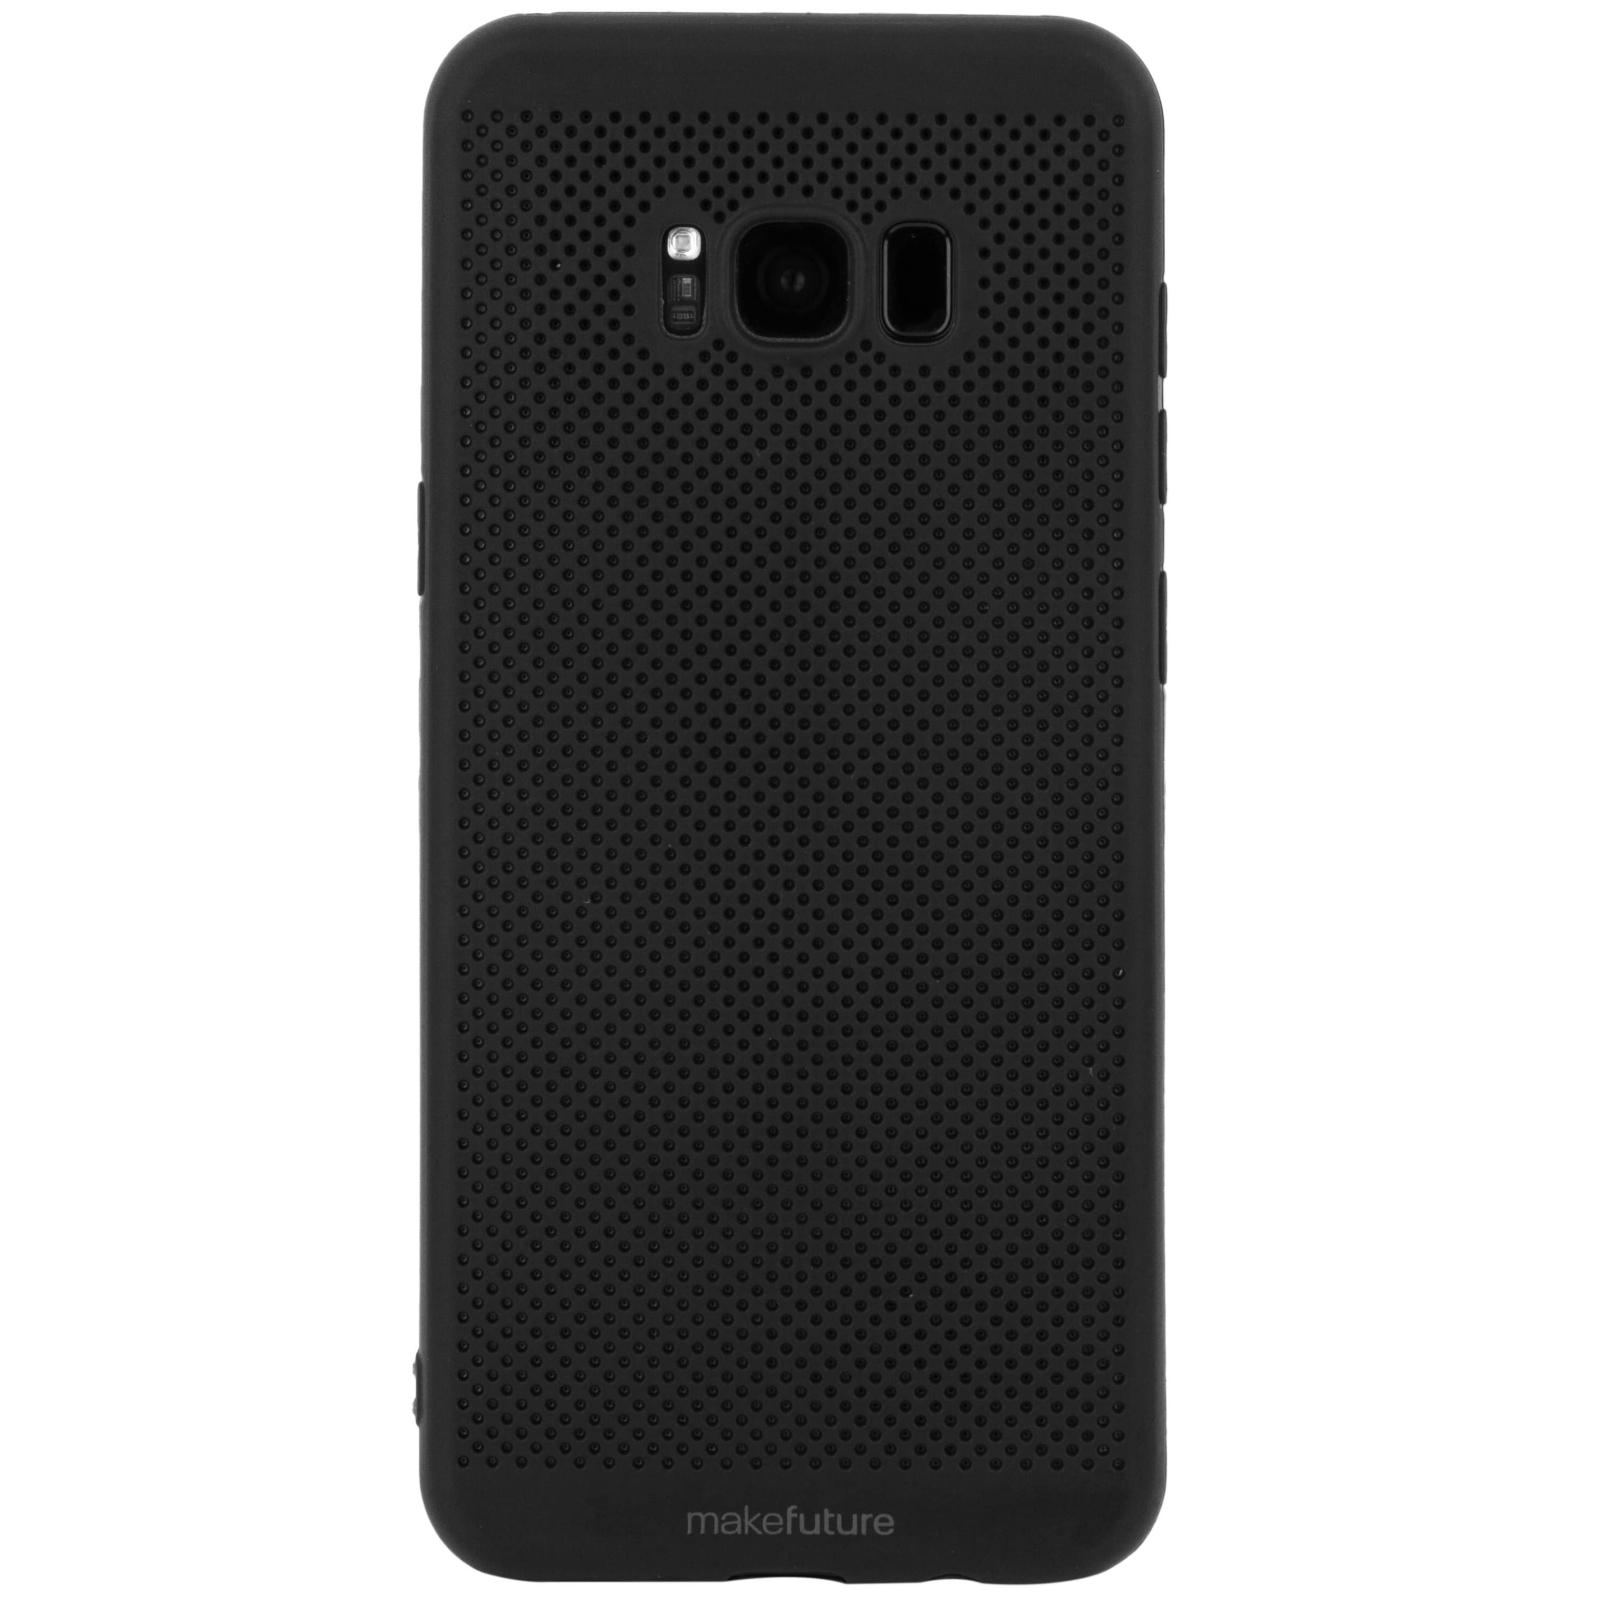 Чехол для моб. телефона MakeFuture Moon Case (TPU) для Samsung S8 Plus Black (MCM-SS8PBK)